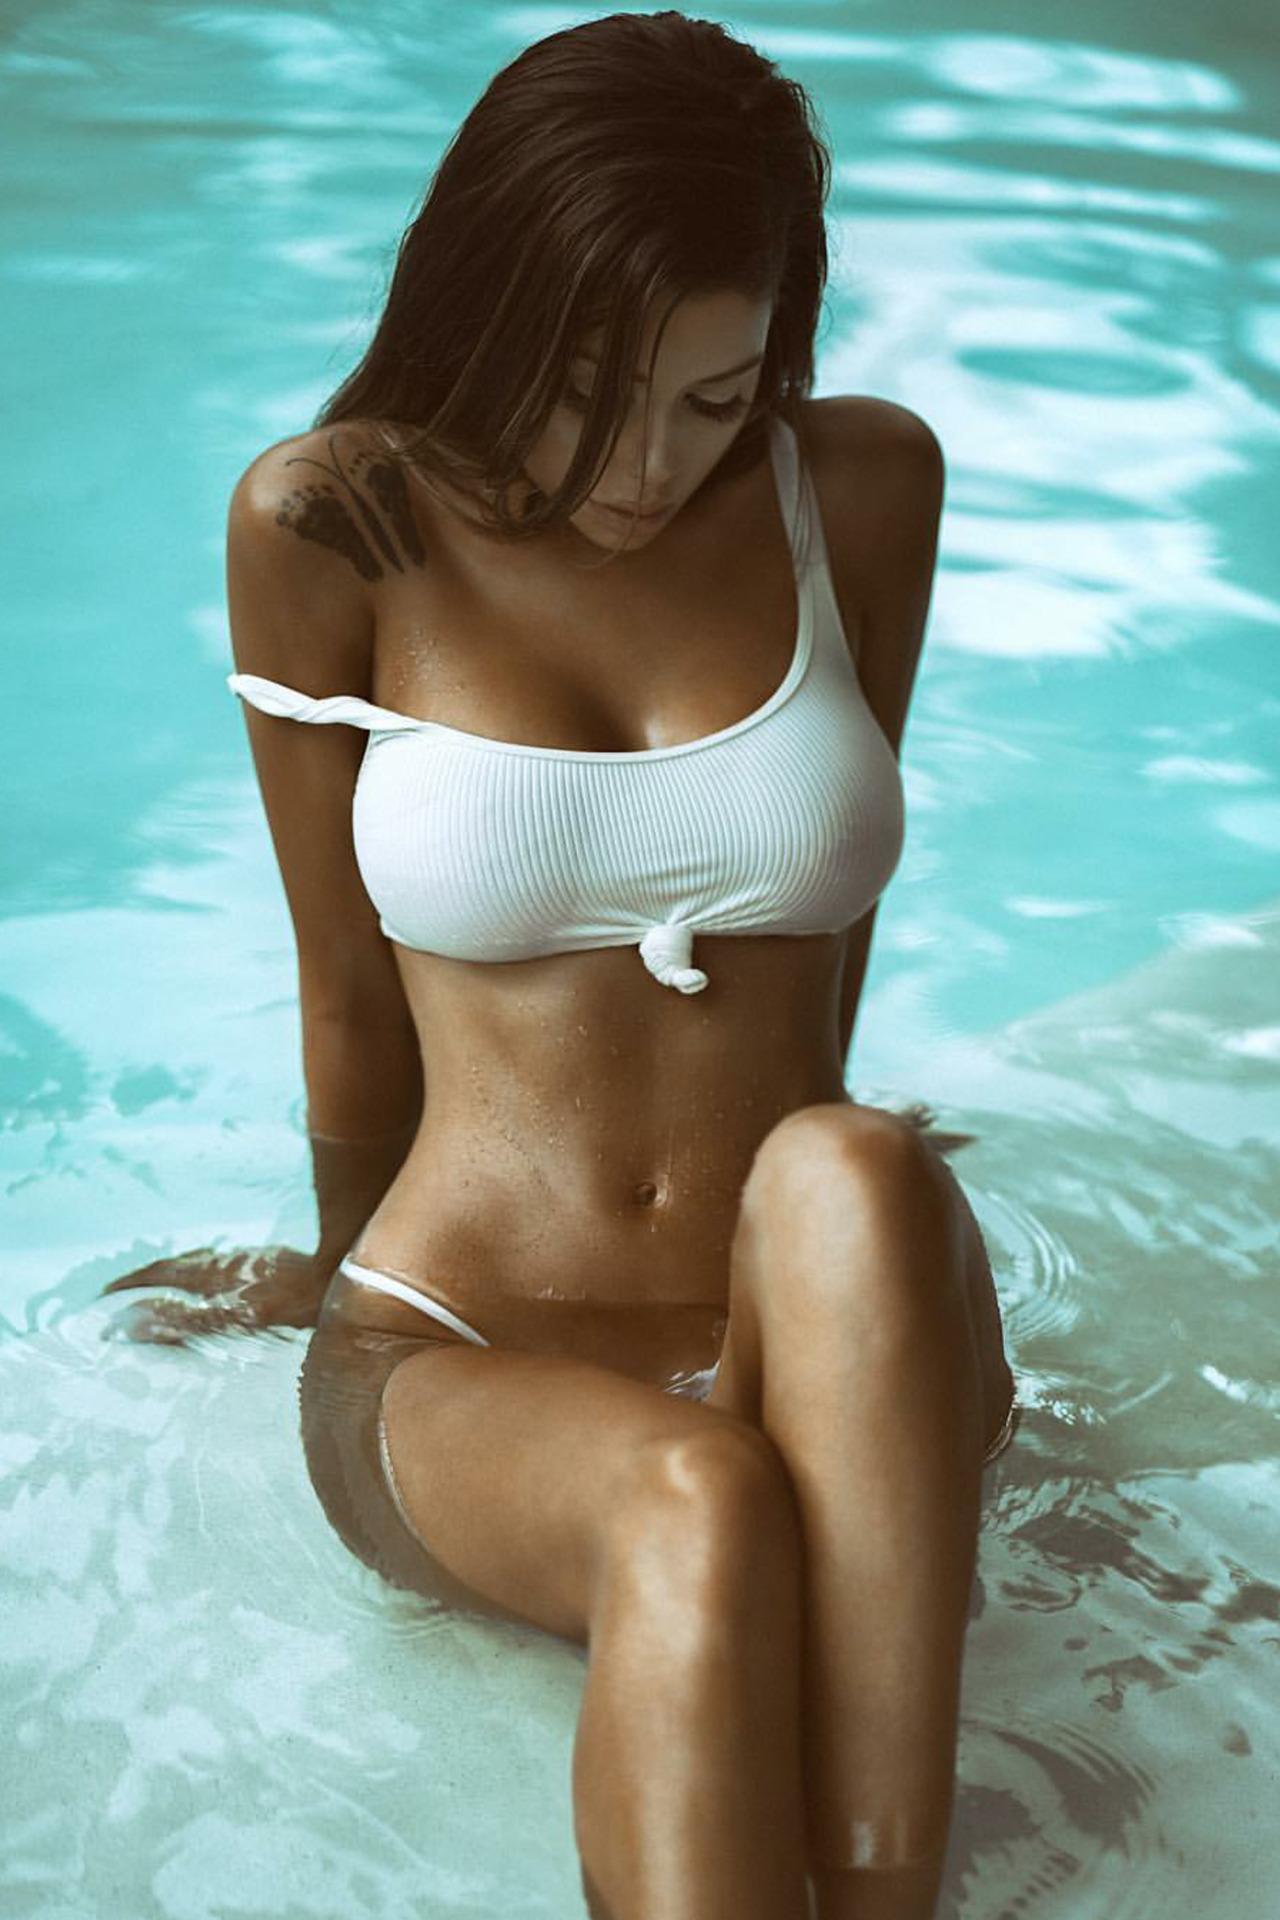 juli waters naked pics